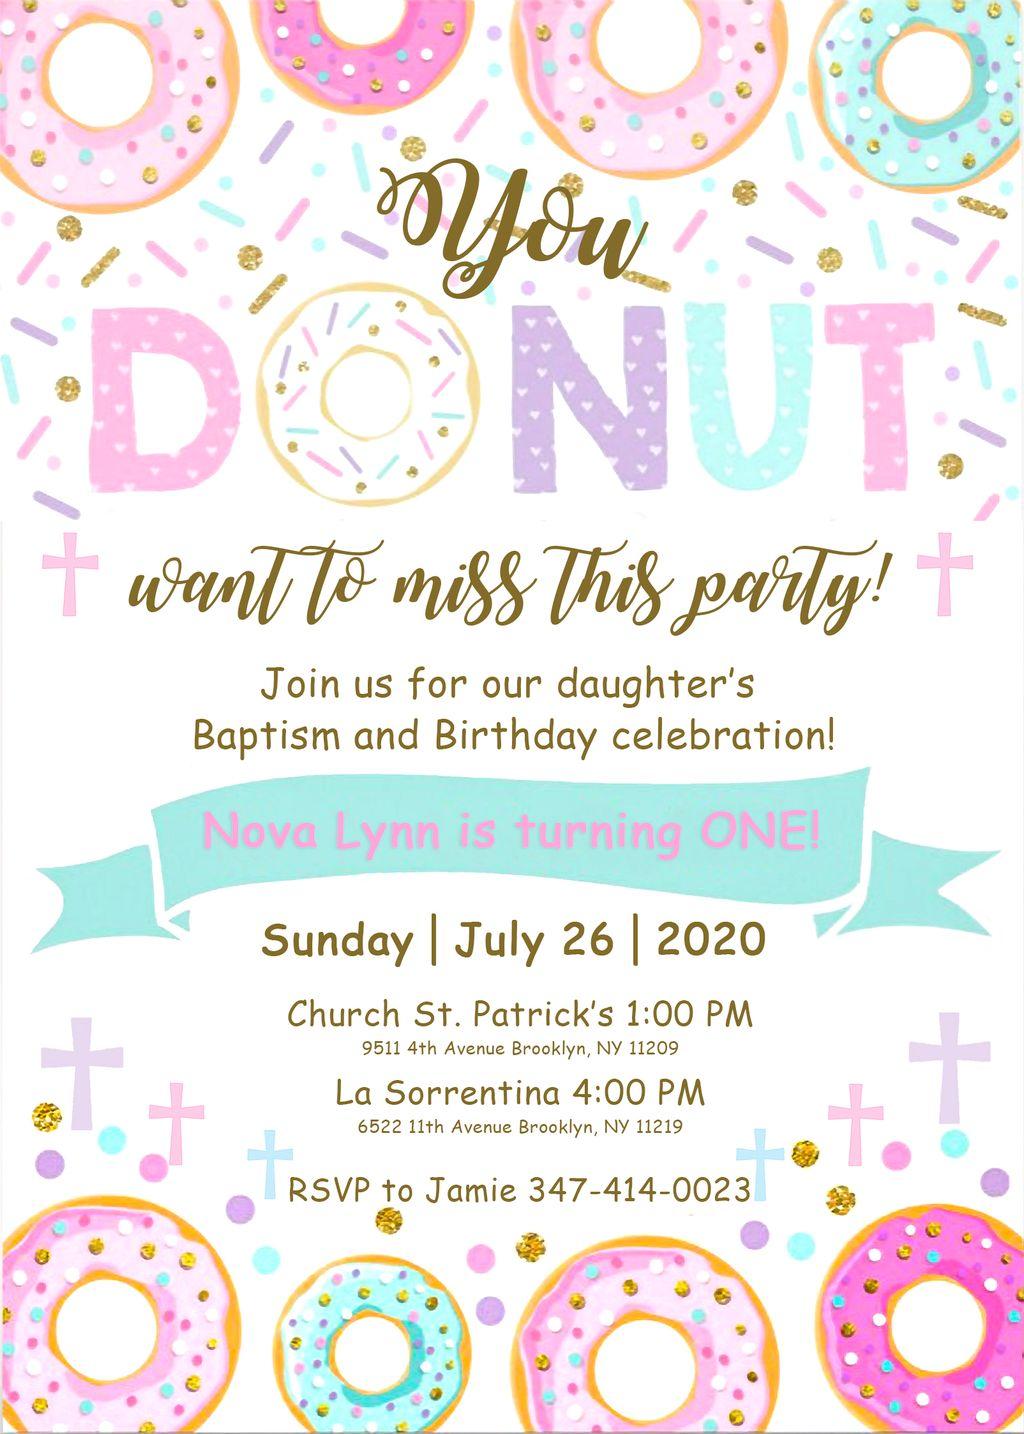 Invitations and printing